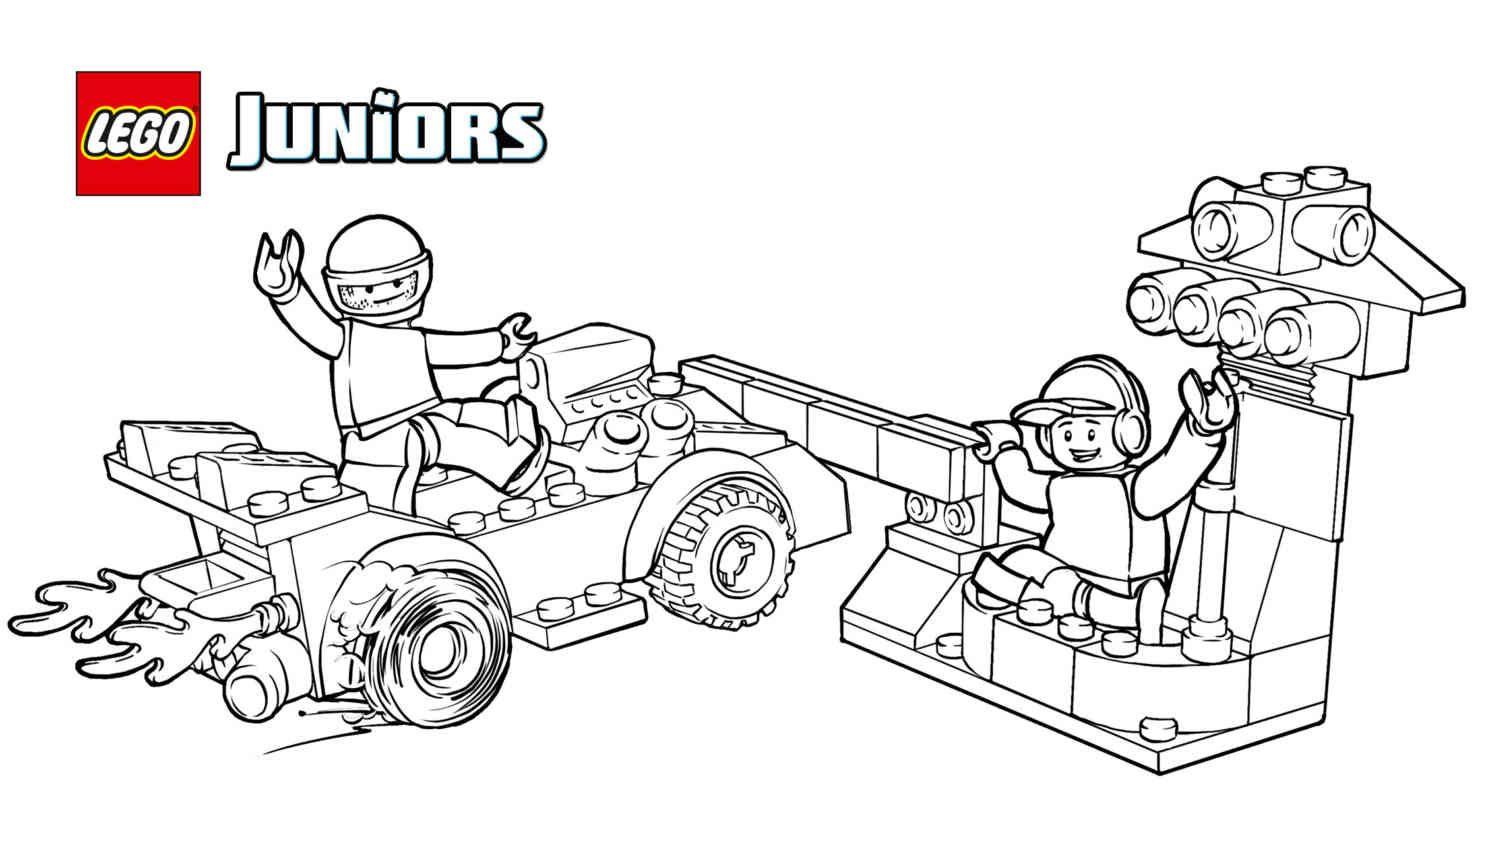 lego juniors race car pit stop coloring page coloring pages boys lego juniors coloring. Black Bedroom Furniture Sets. Home Design Ideas